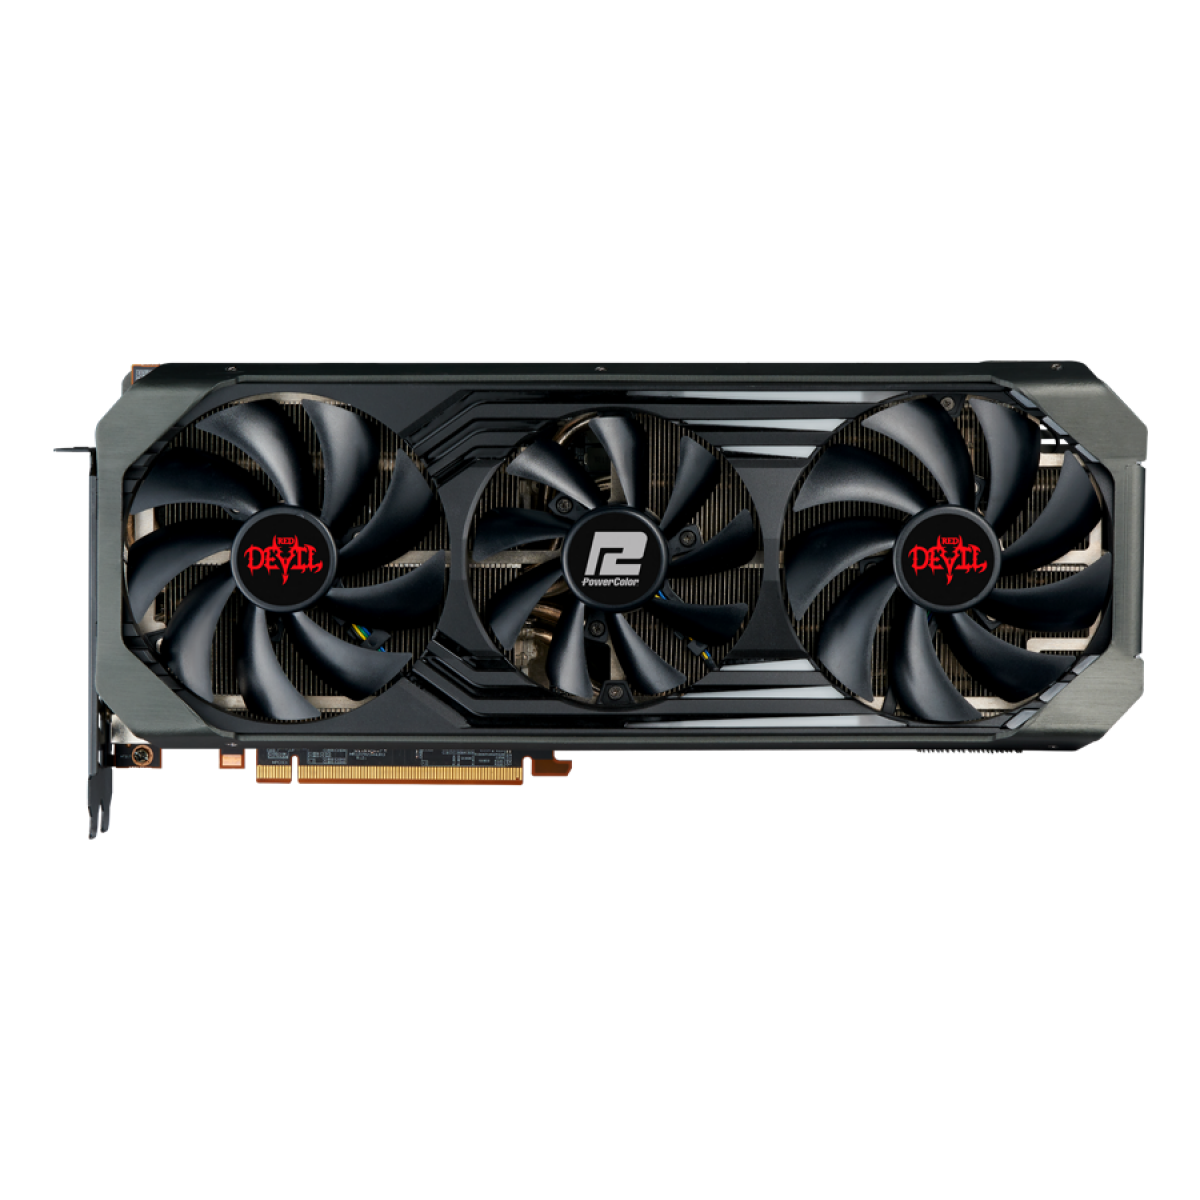 Kit Upgrade PowerColor Radeon RX 6900 XT Red Devil + AMD Ryzen 9 5950X + Brinde Jogo Dirt 5